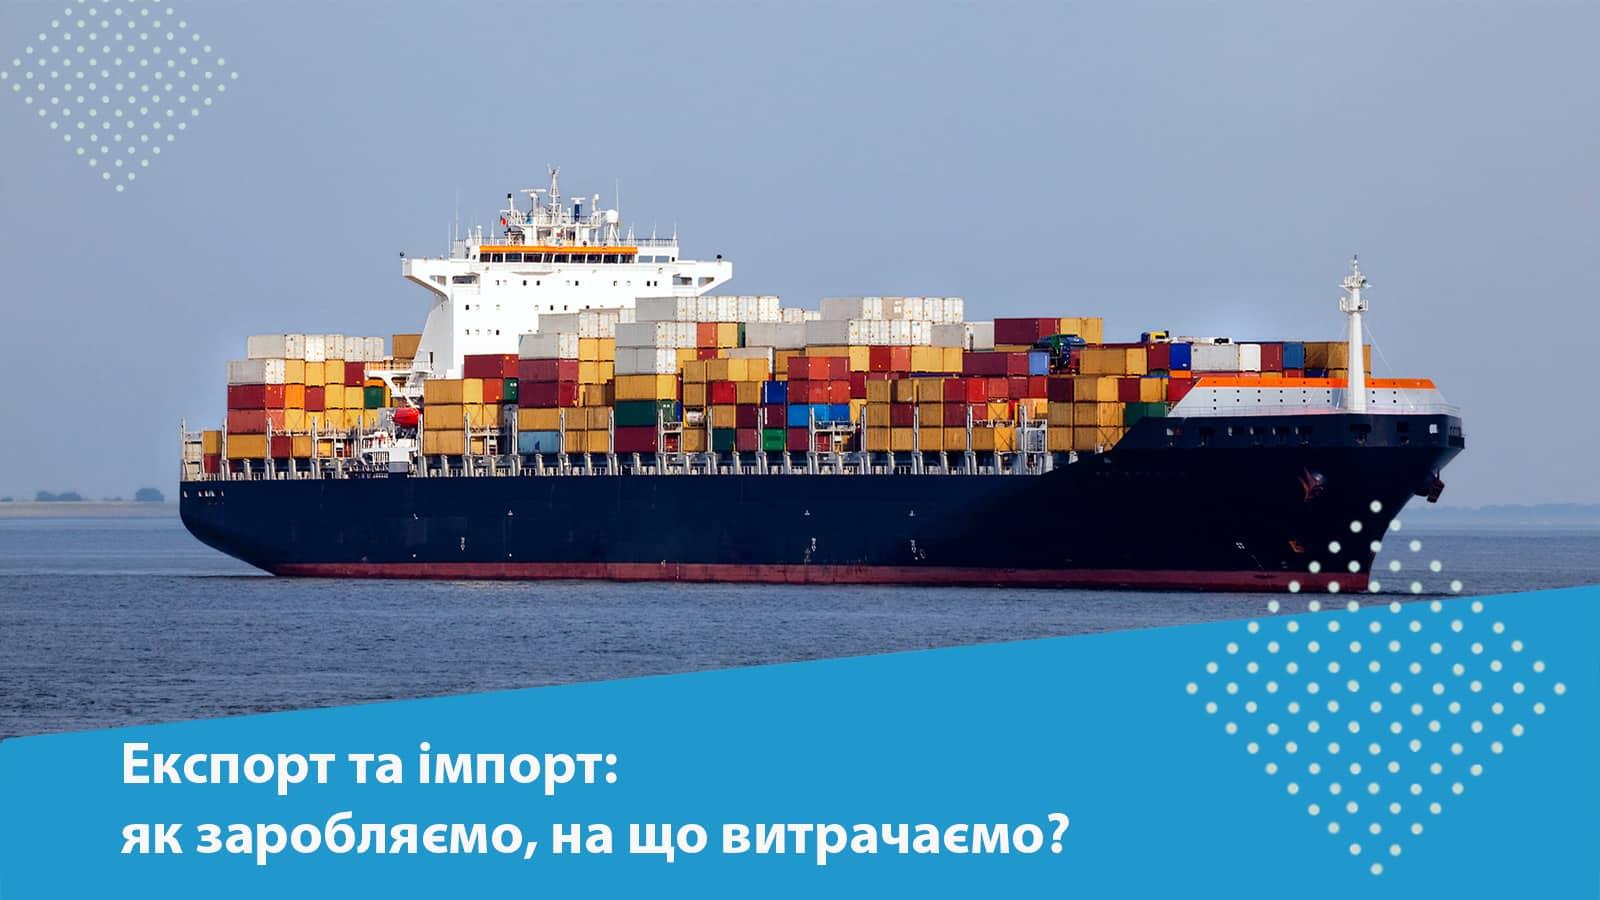 судно з товарами